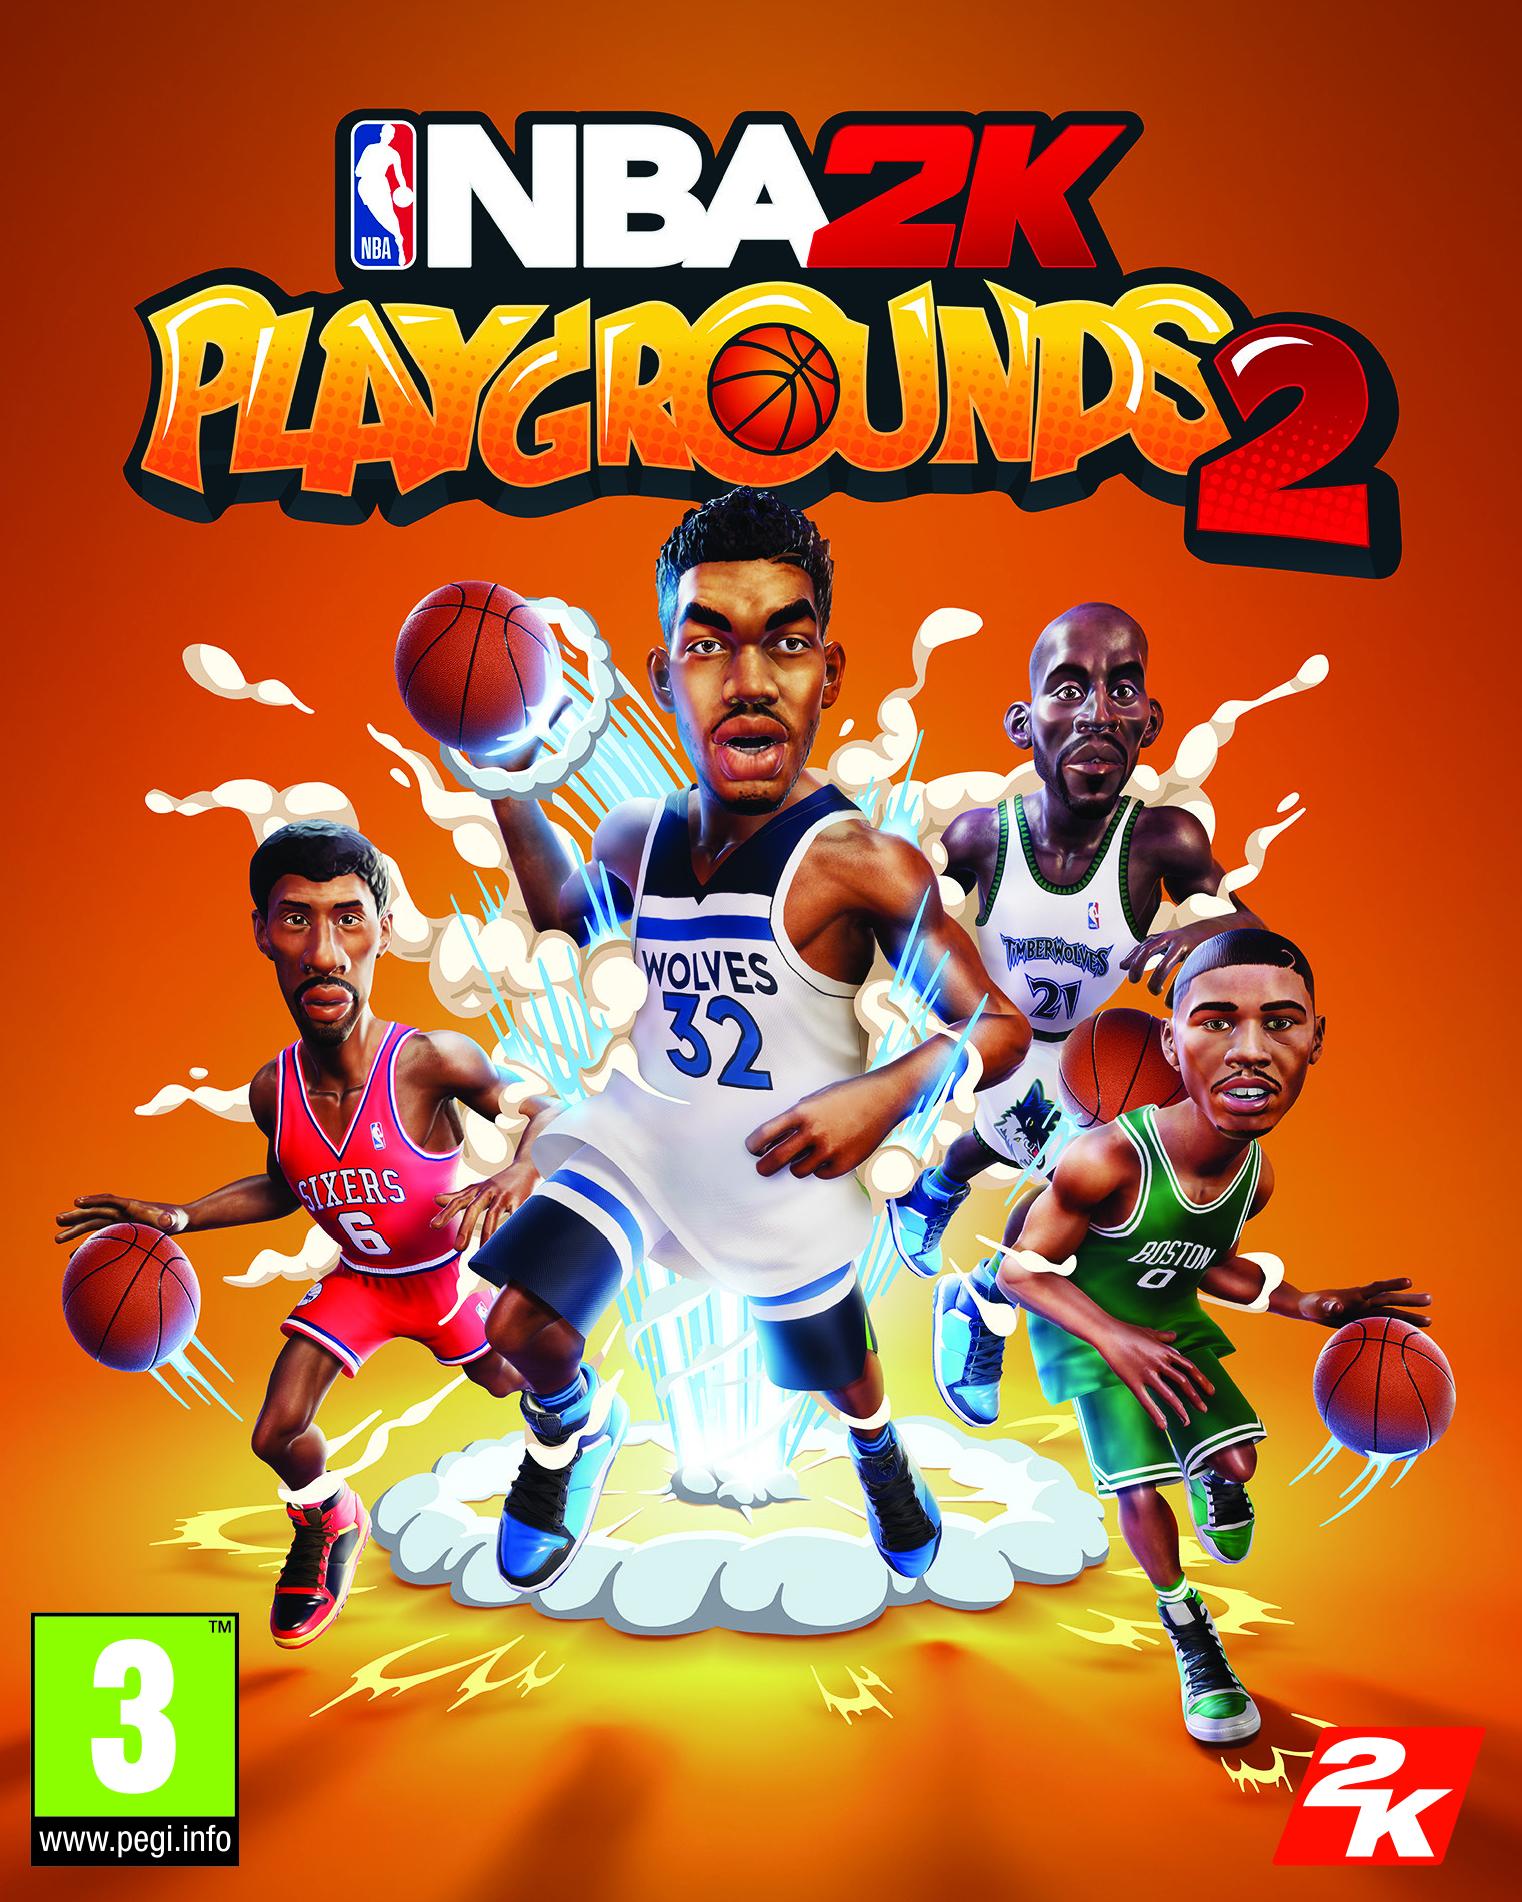 NBA 2K Playgrounds 2 (PC) DIGITAL